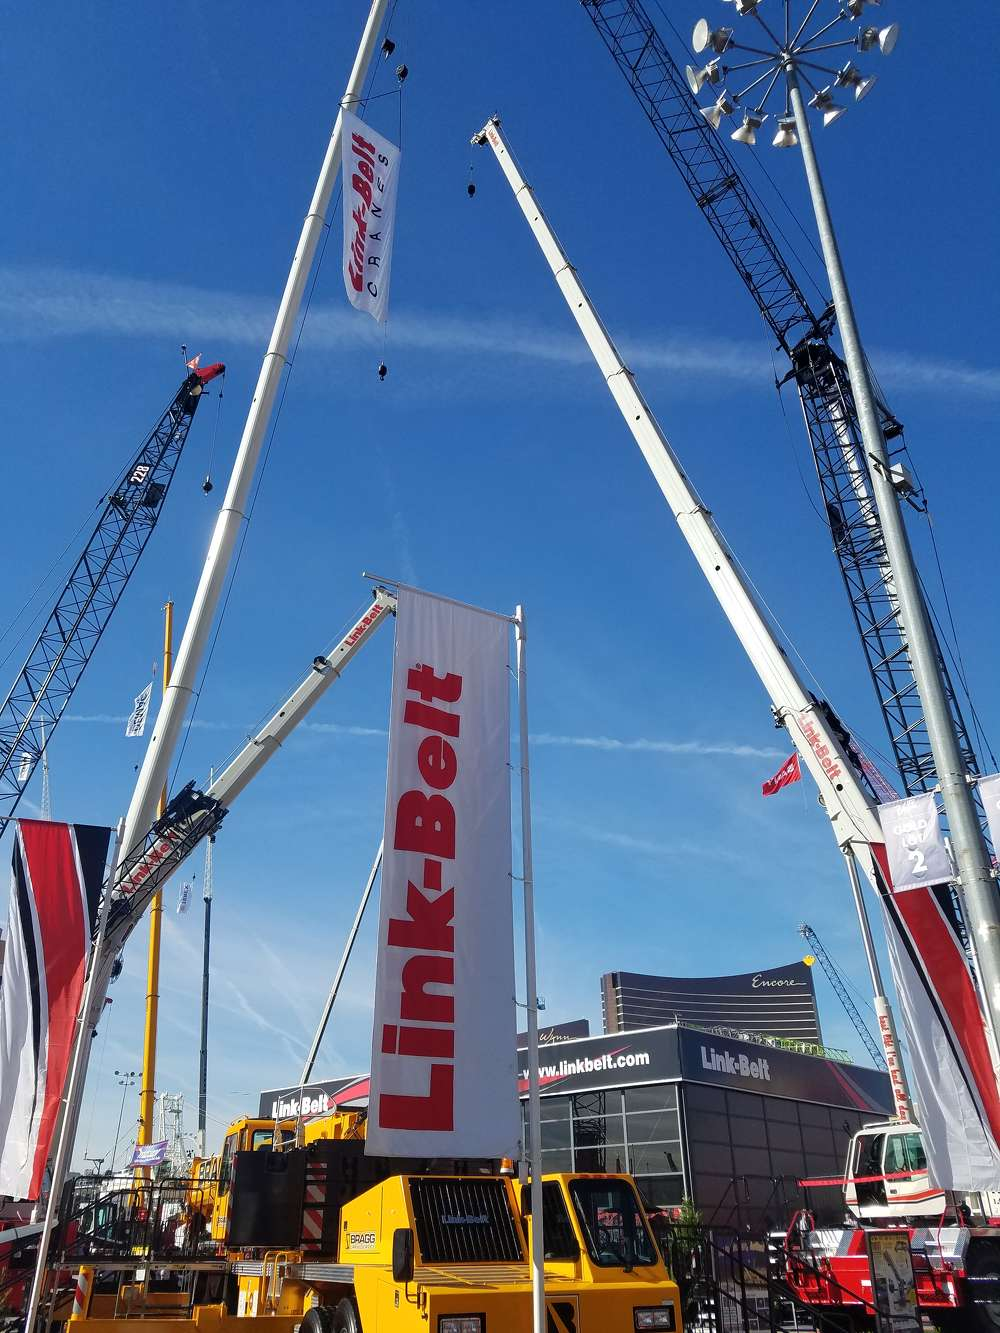 (JM) MNSW (Link-Belt cranes) Link-Belt cranes line the Vegas sky at ConExpo.